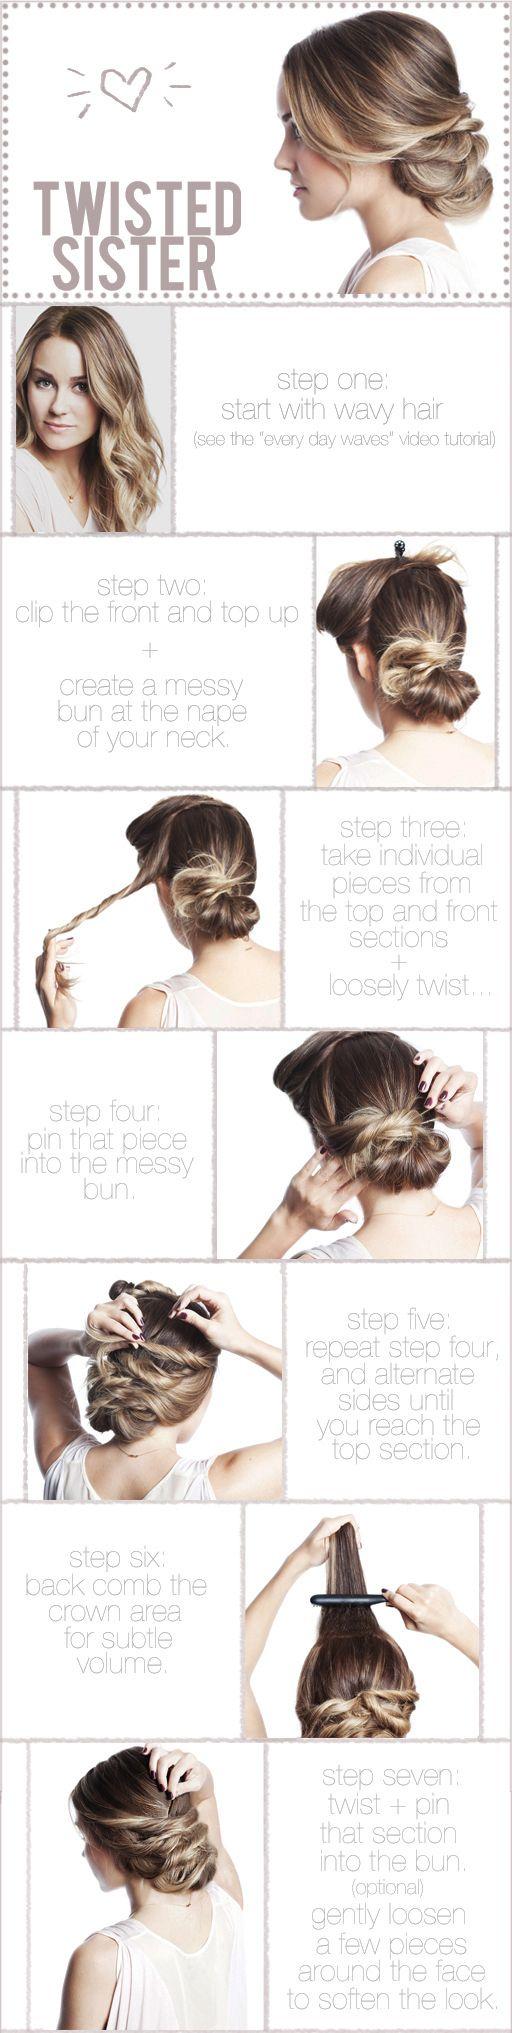 Astonishing 14 Bridal Hair Tutorials Pretty Designs Short Hairstyles For Black Women Fulllsitofus